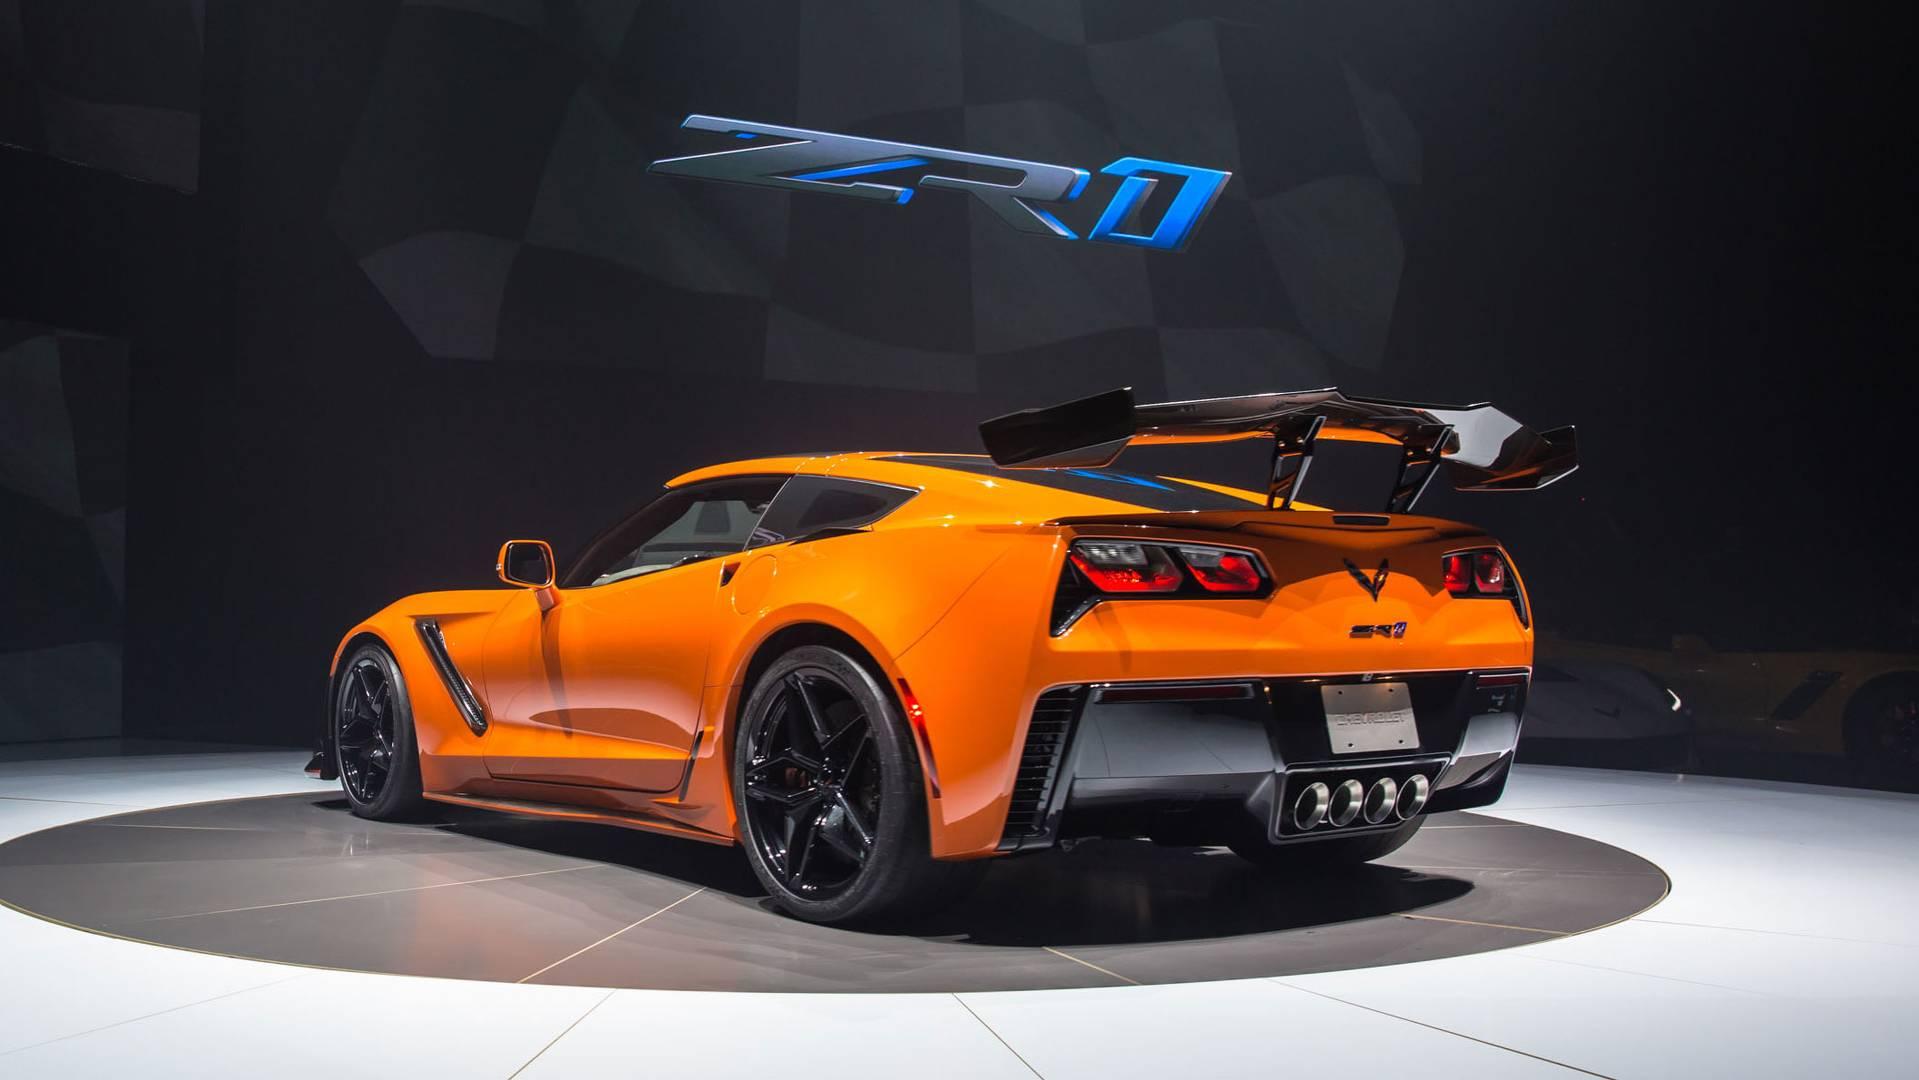 2019 chevy corvette zr1 debuts with 755 horsepower. Black Bedroom Furniture Sets. Home Design Ideas